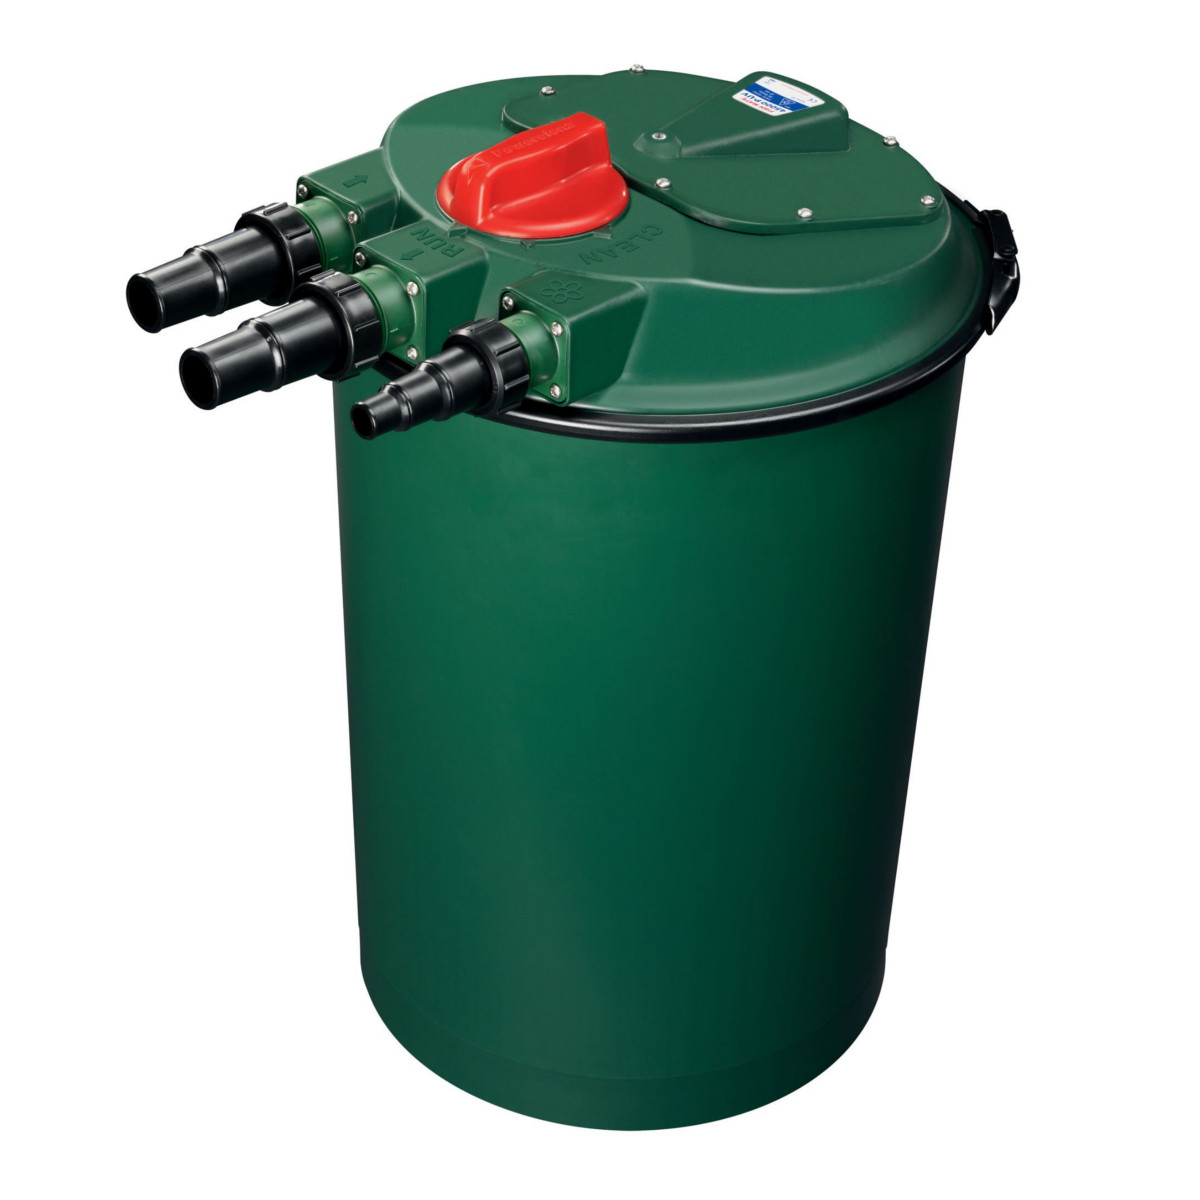 Fish mate powerclenz 45000 p uv pond filter for Pond filter maintenance